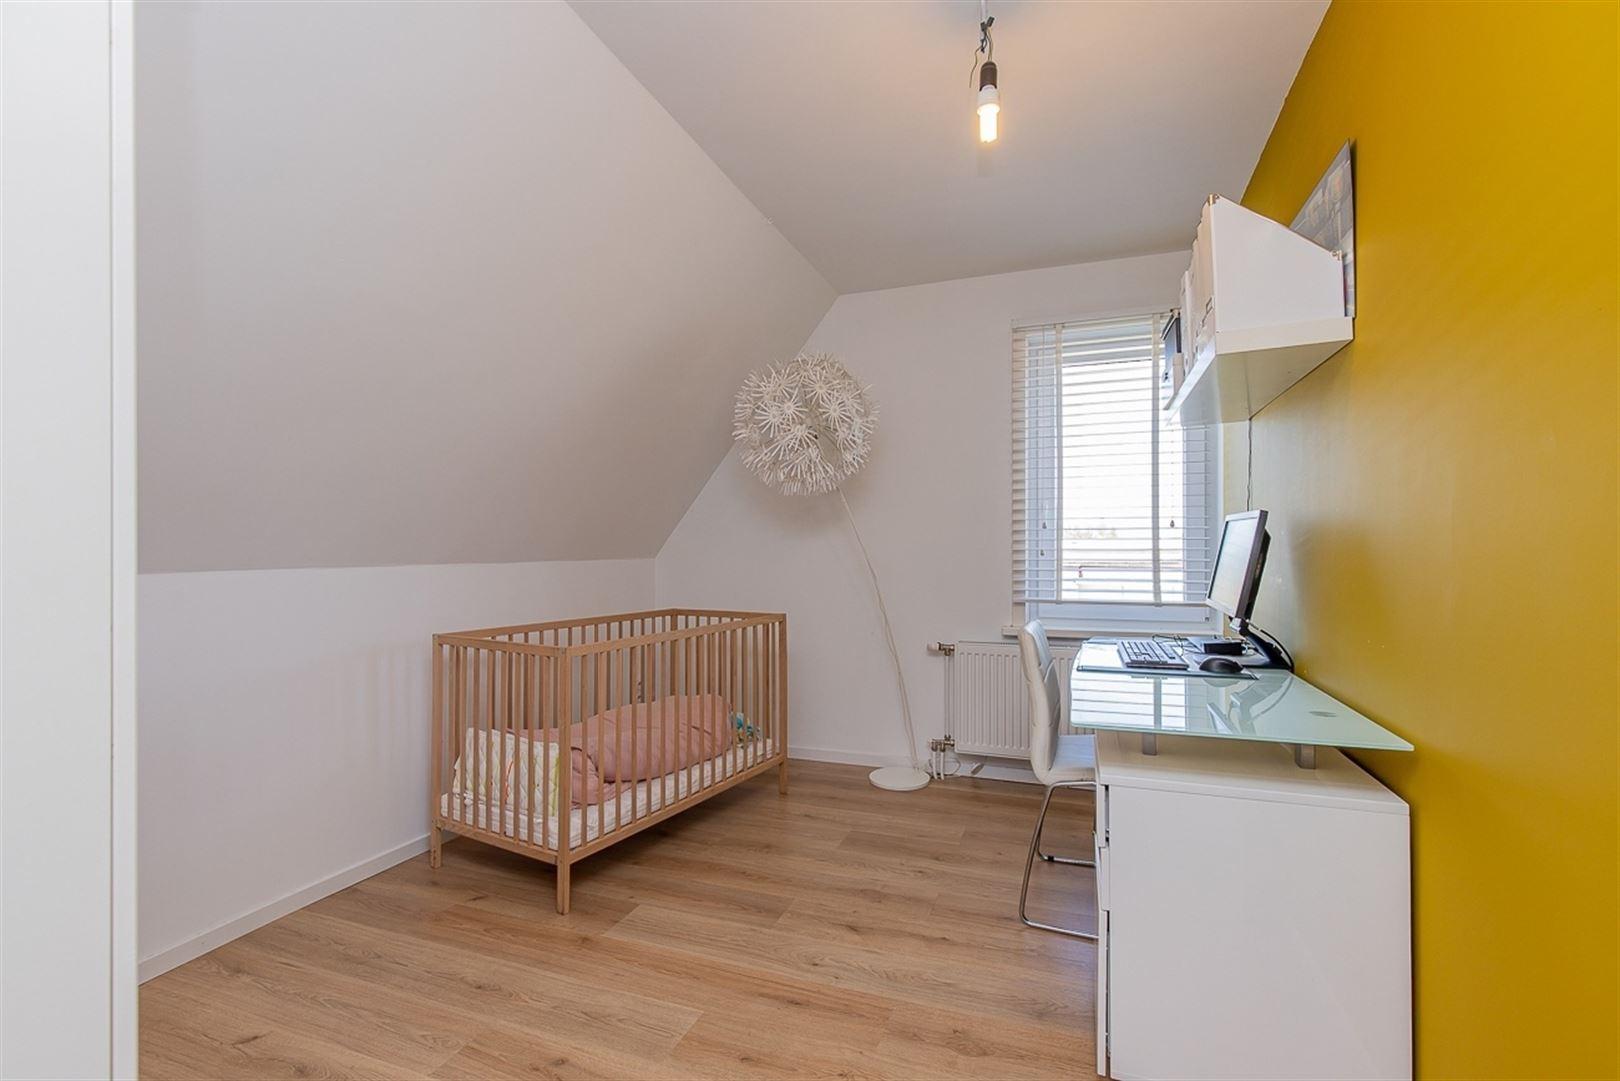 Foto 15 : Villa te 9100 SINT-NIKLAAS (België) - Prijs € 549.000